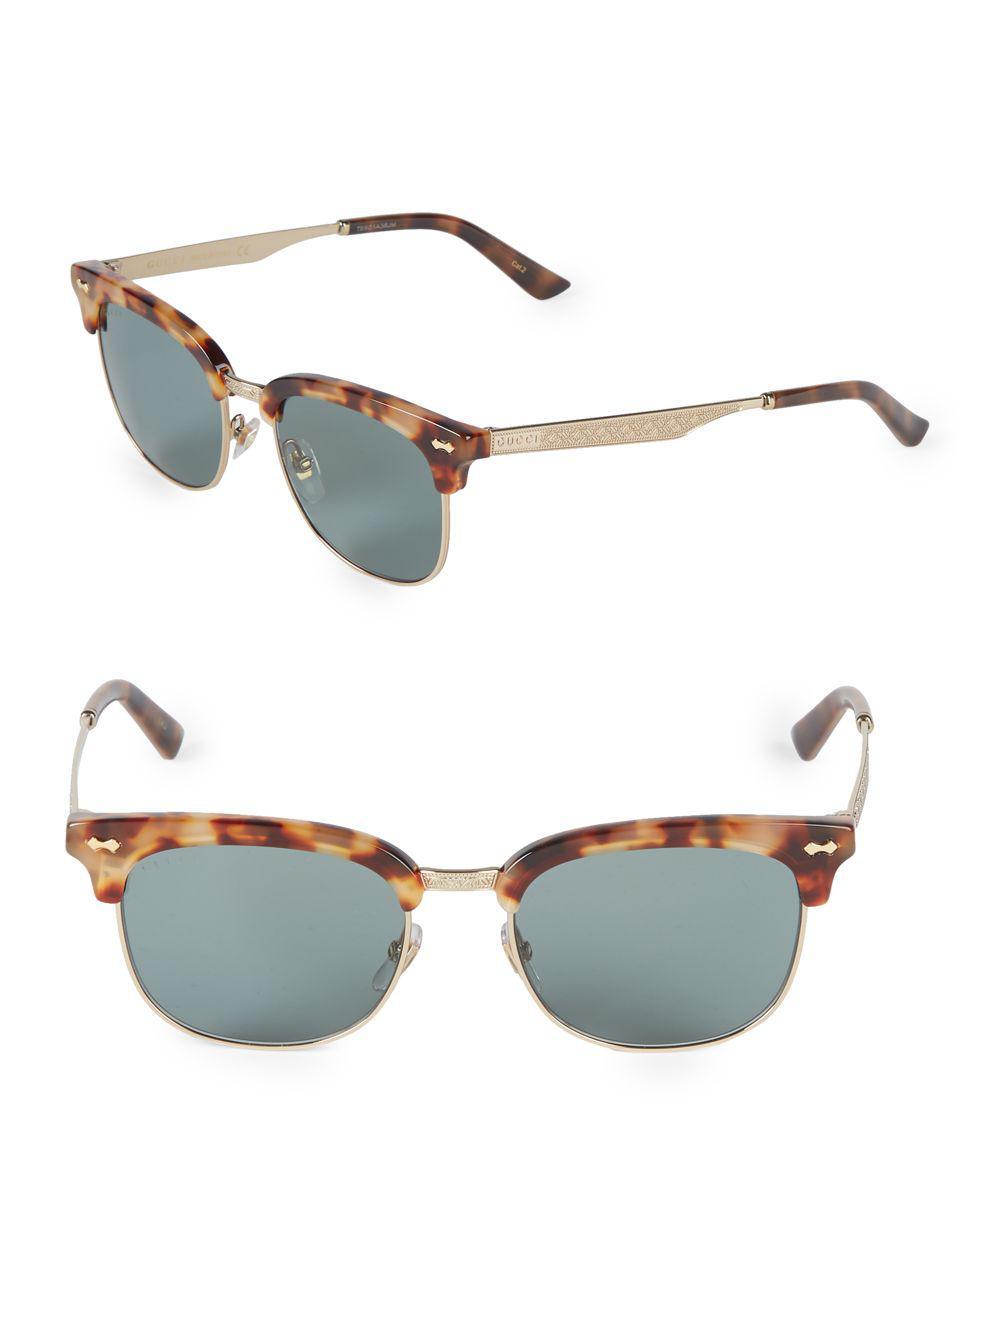 967240756c6 Gucci 54mm Clubmaster Sunglasses in Metallic - Lyst